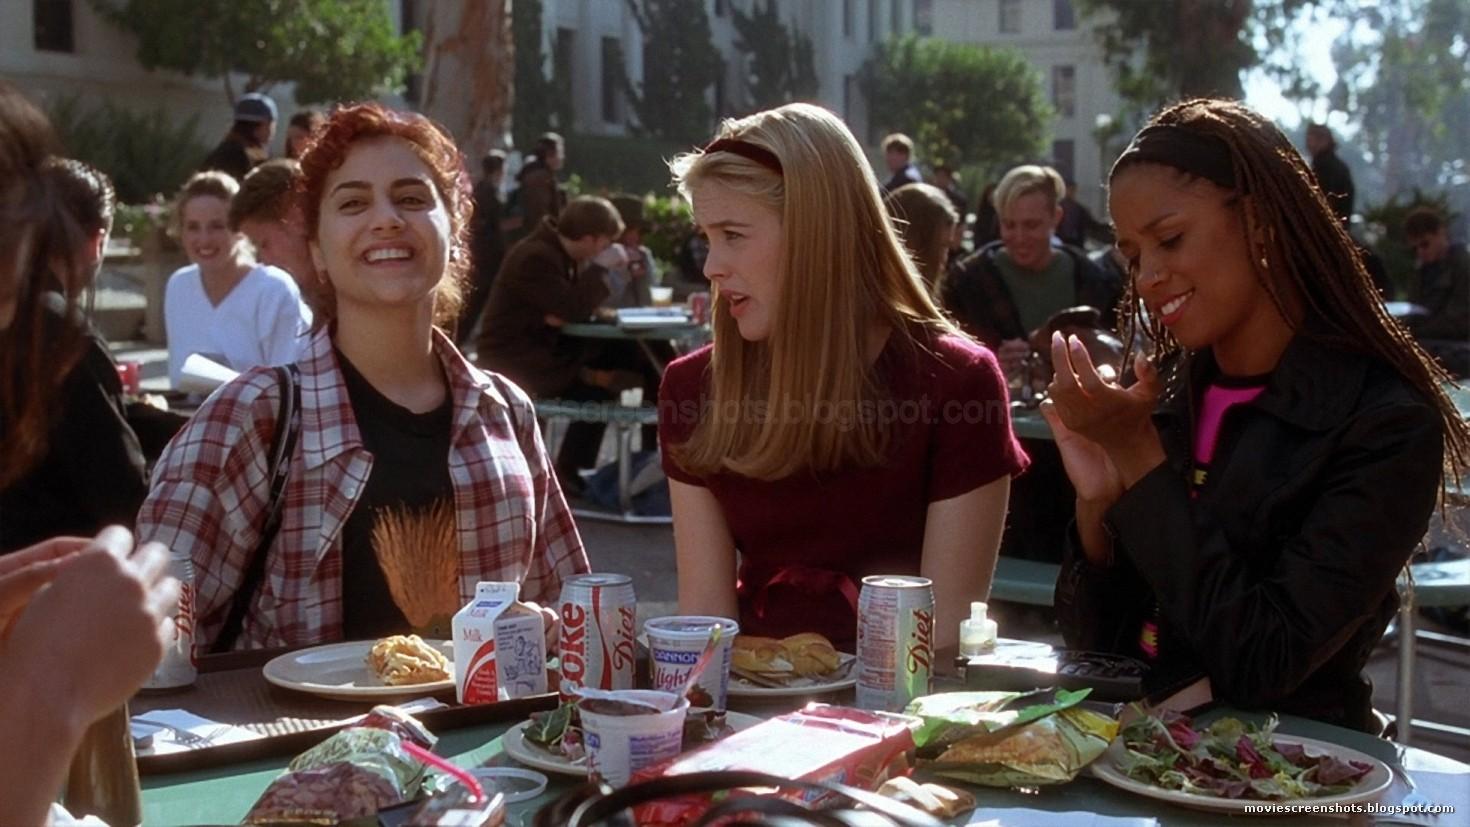 vagebonds movie screenshots clueless 1995